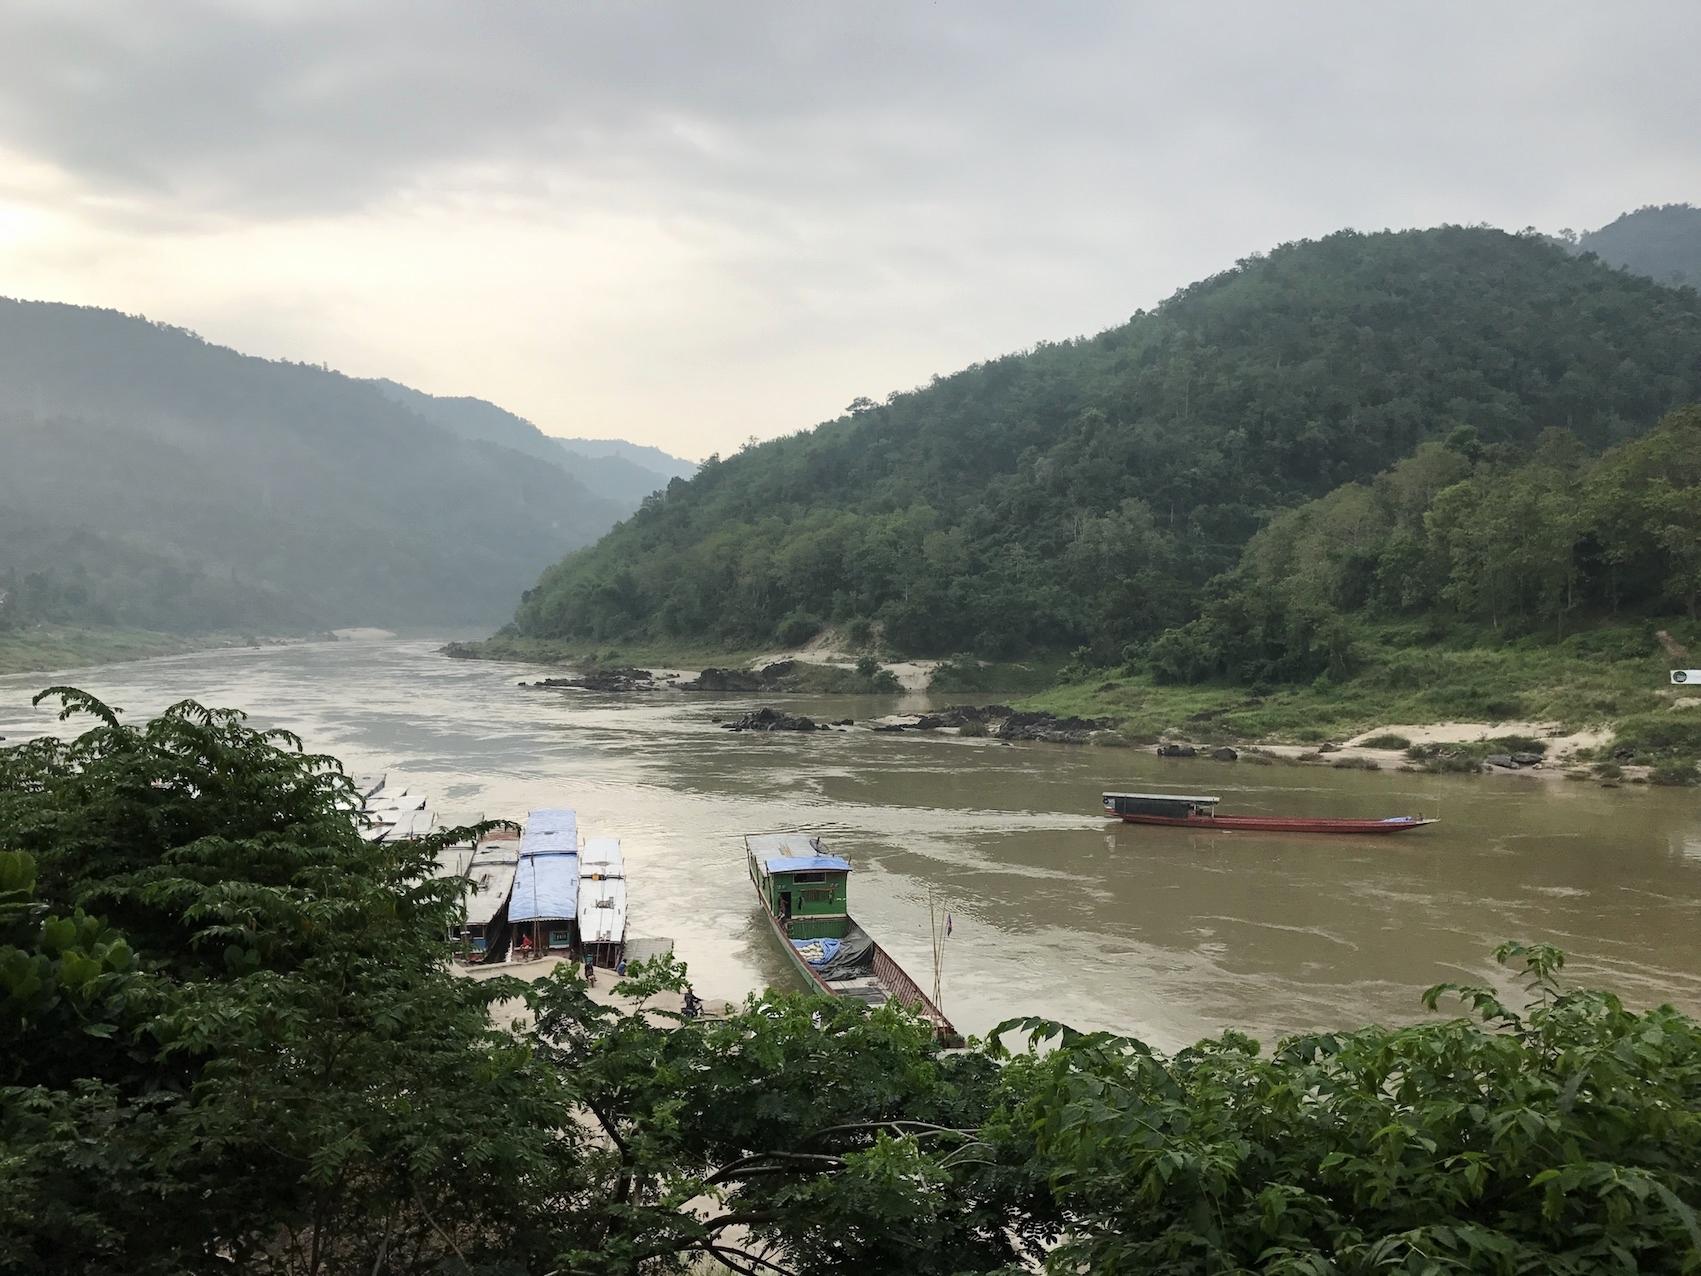 House Boats On The Mekong